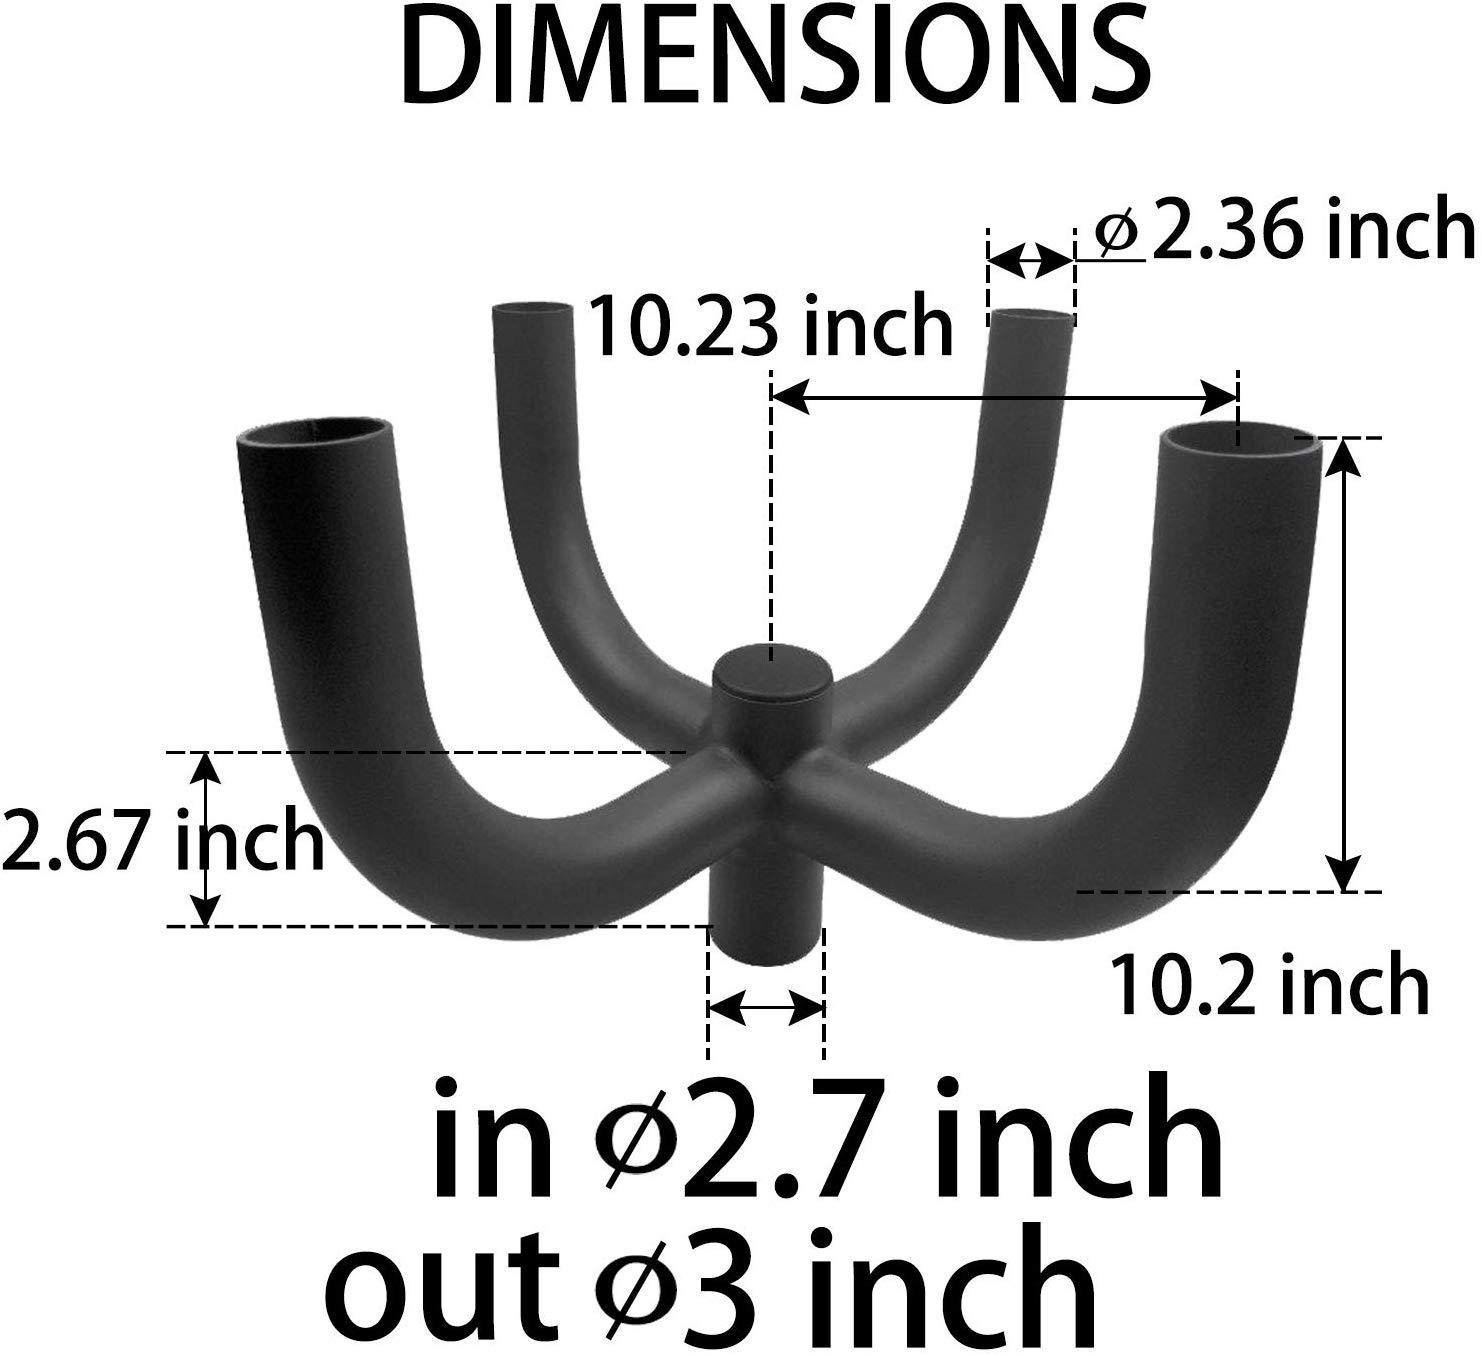 Small 4 Light Bullhorn, 4 Way Quad at 90 degrees, 2 Feet Wide, slips on 2-3/8 tenon